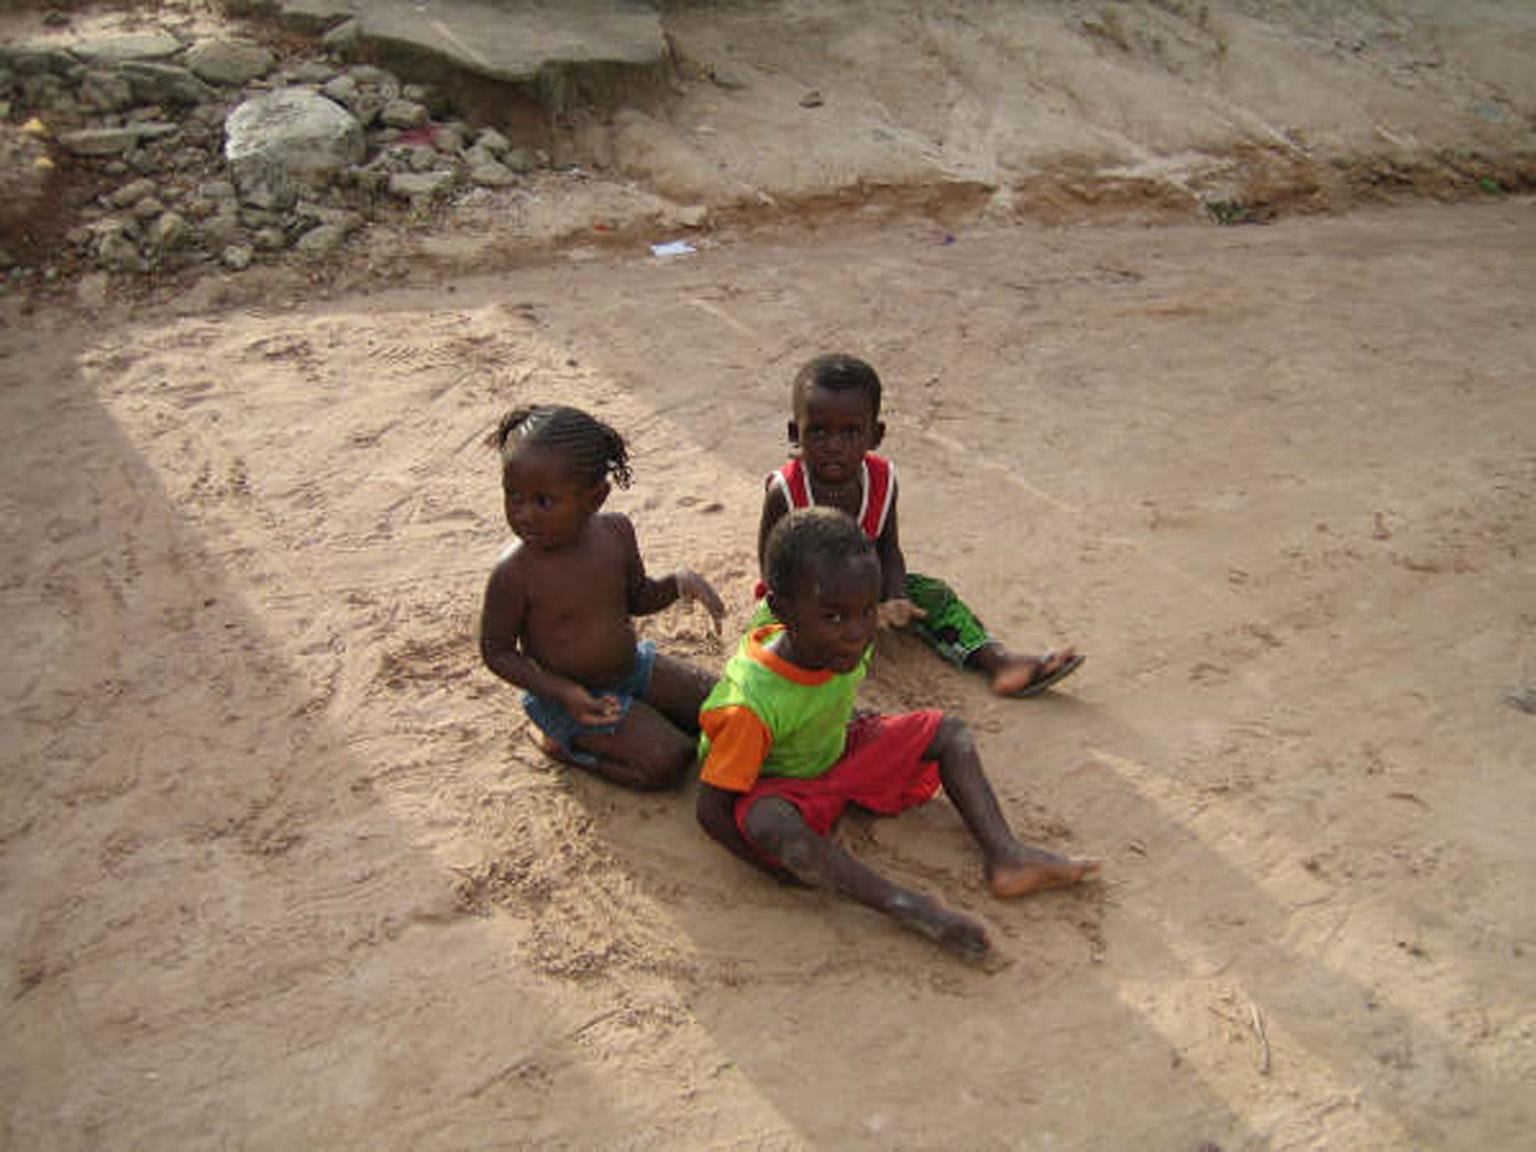 SIERRA LEONA 15